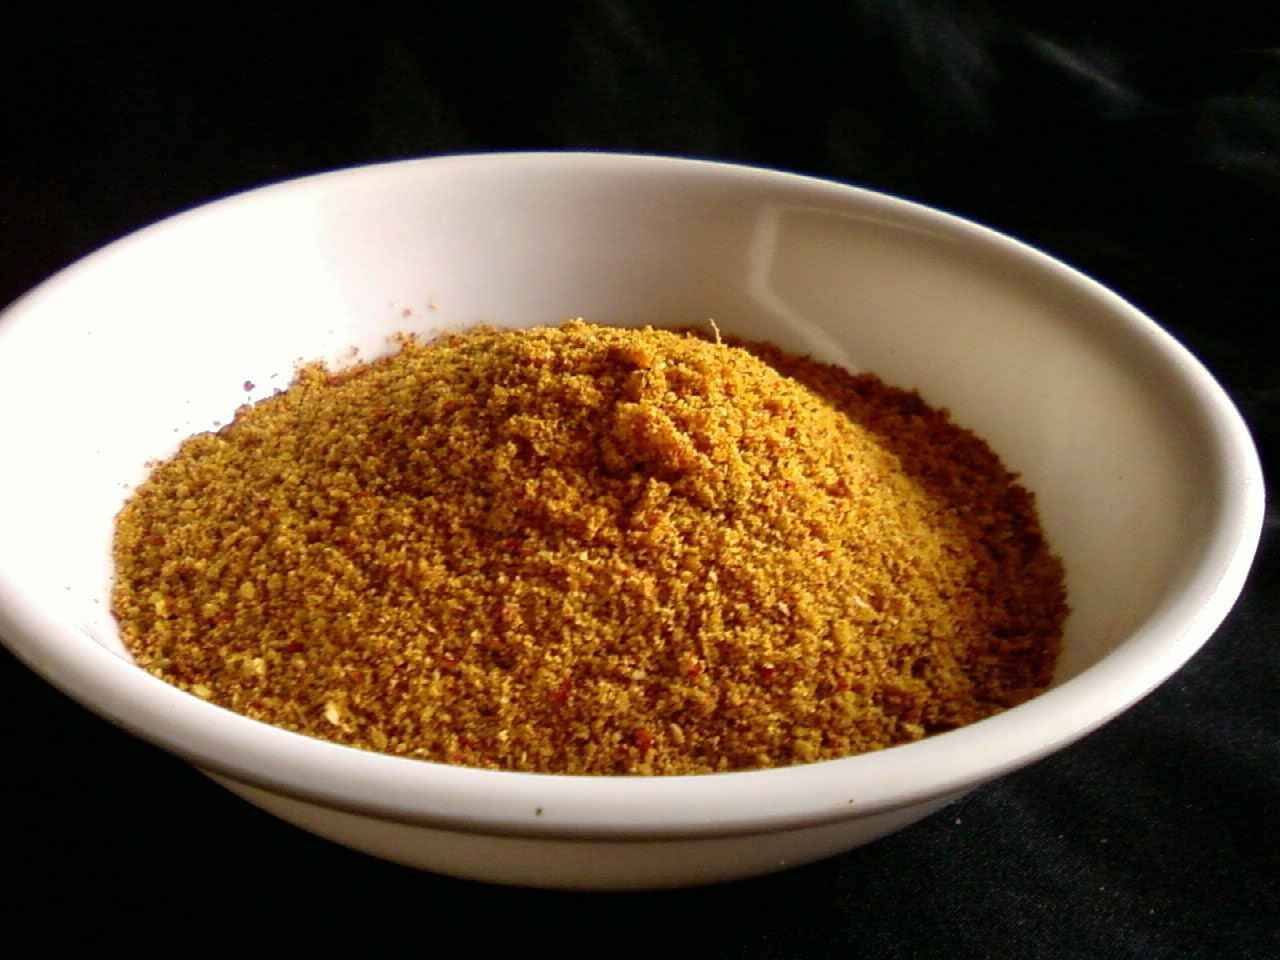 Sweet Potato Powder  Spicy Sweet Potato Powder Blend with Spices